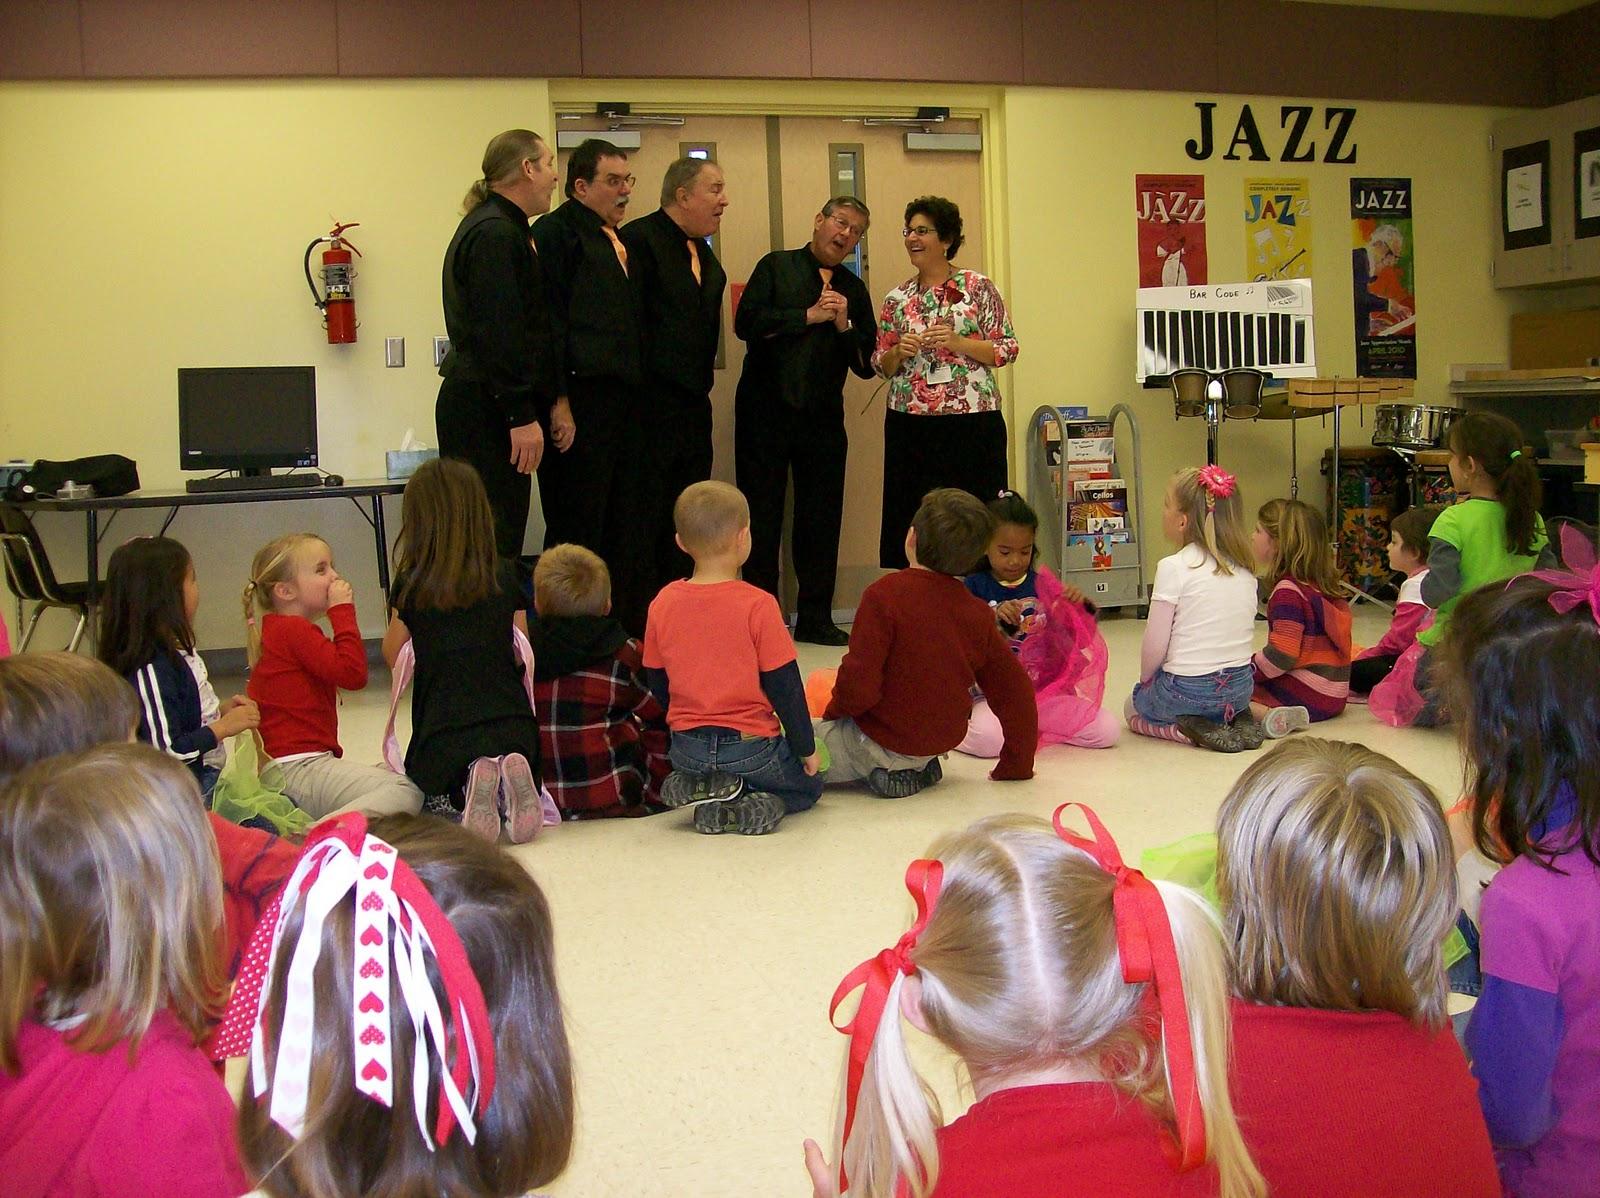 Barbershop Music : Music Matters: Big Orange Barbershop Quartet